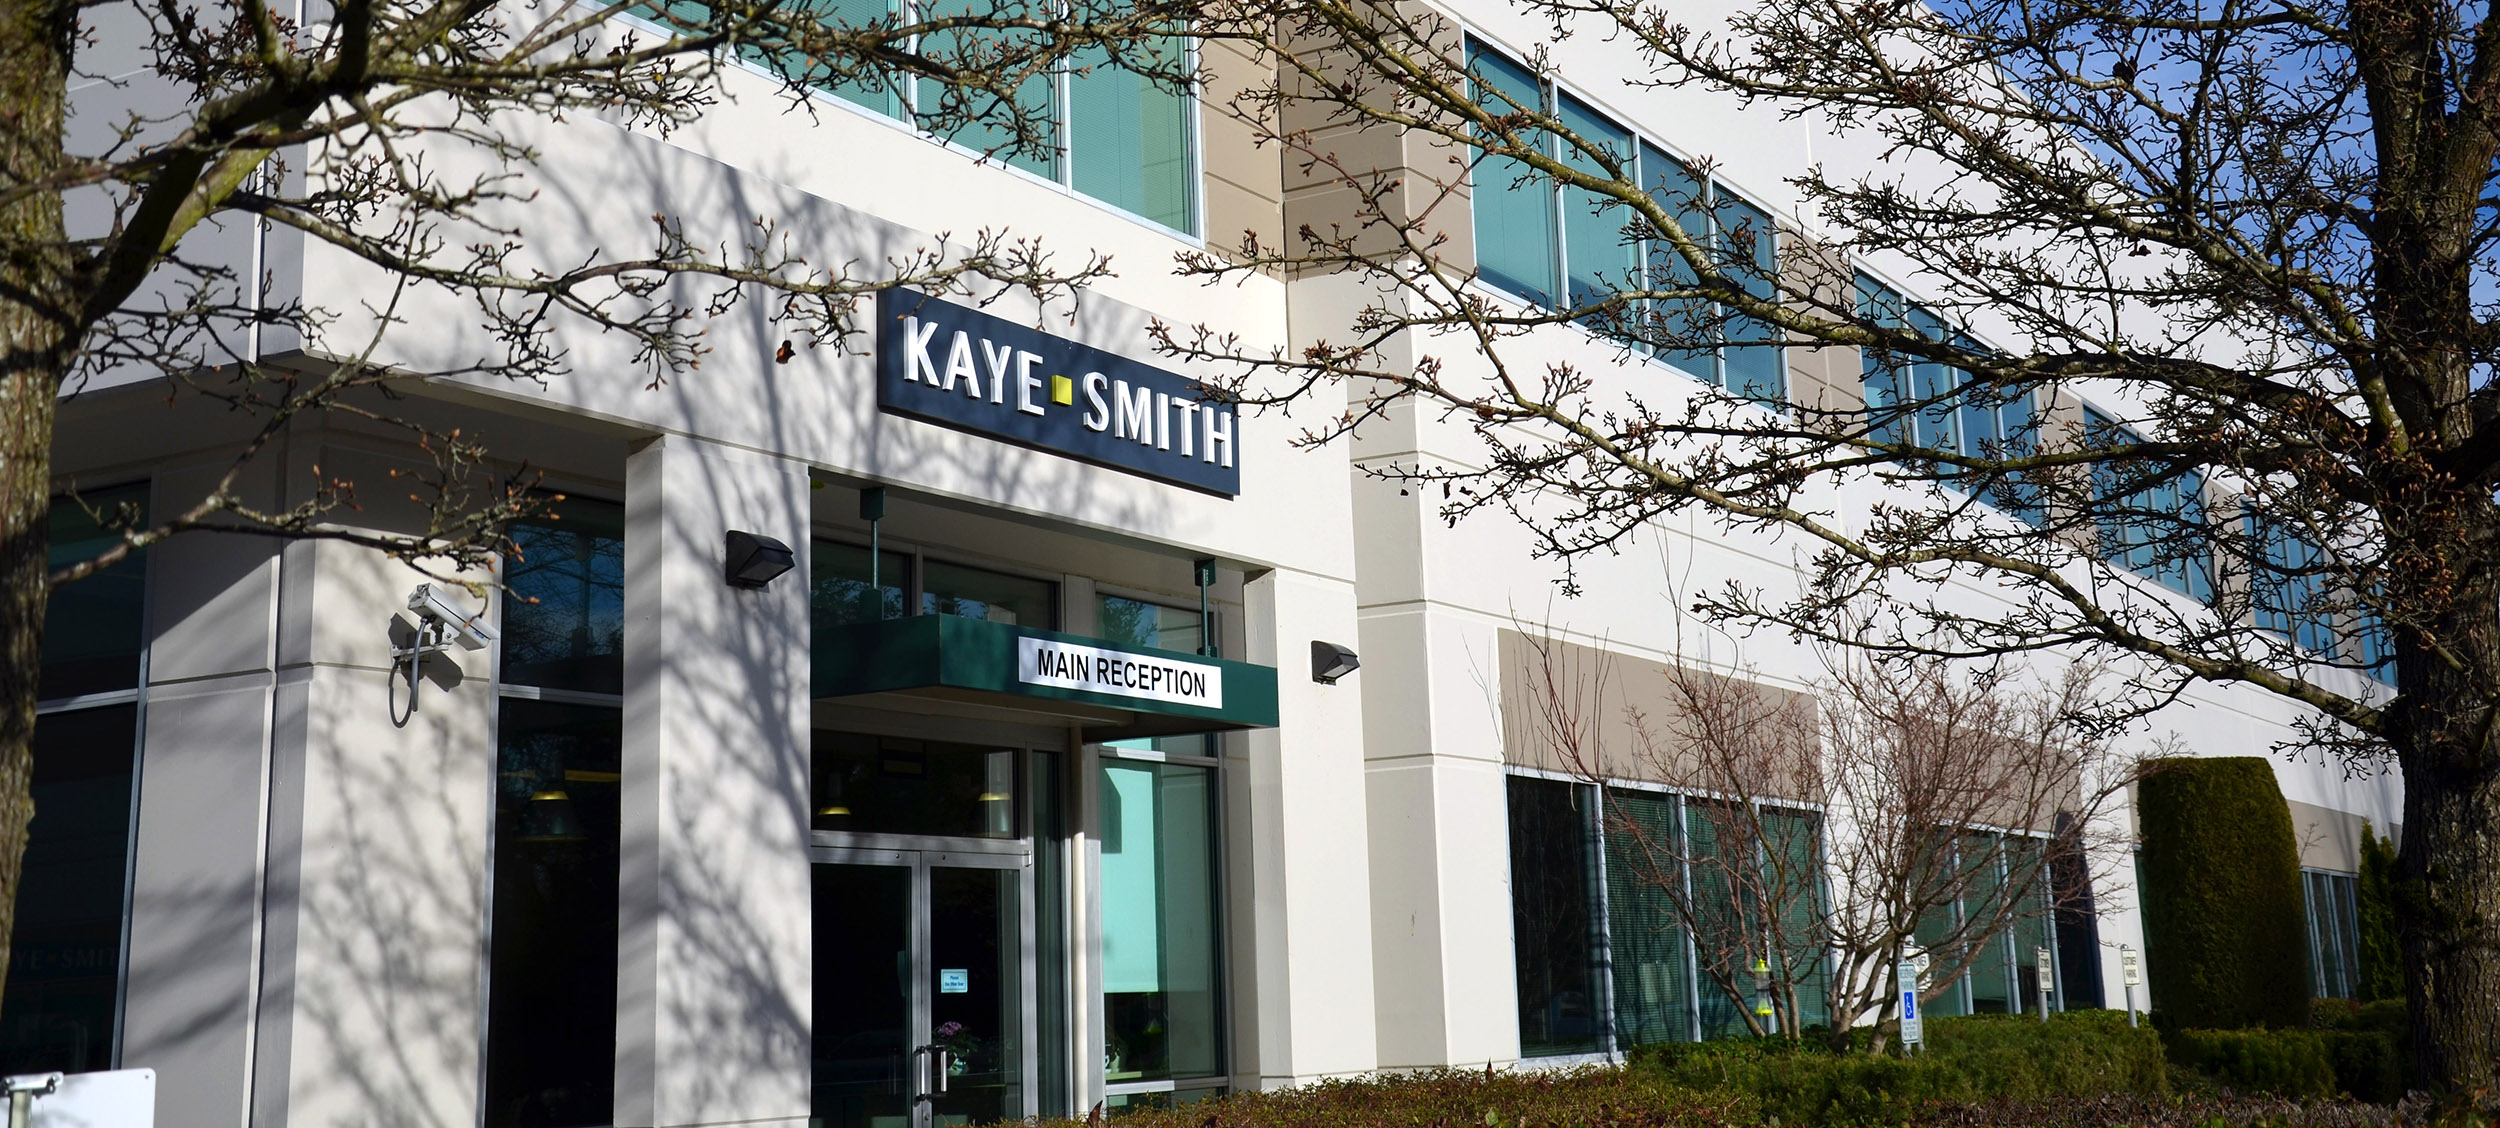 Kaye-Smith Update: COVID-19